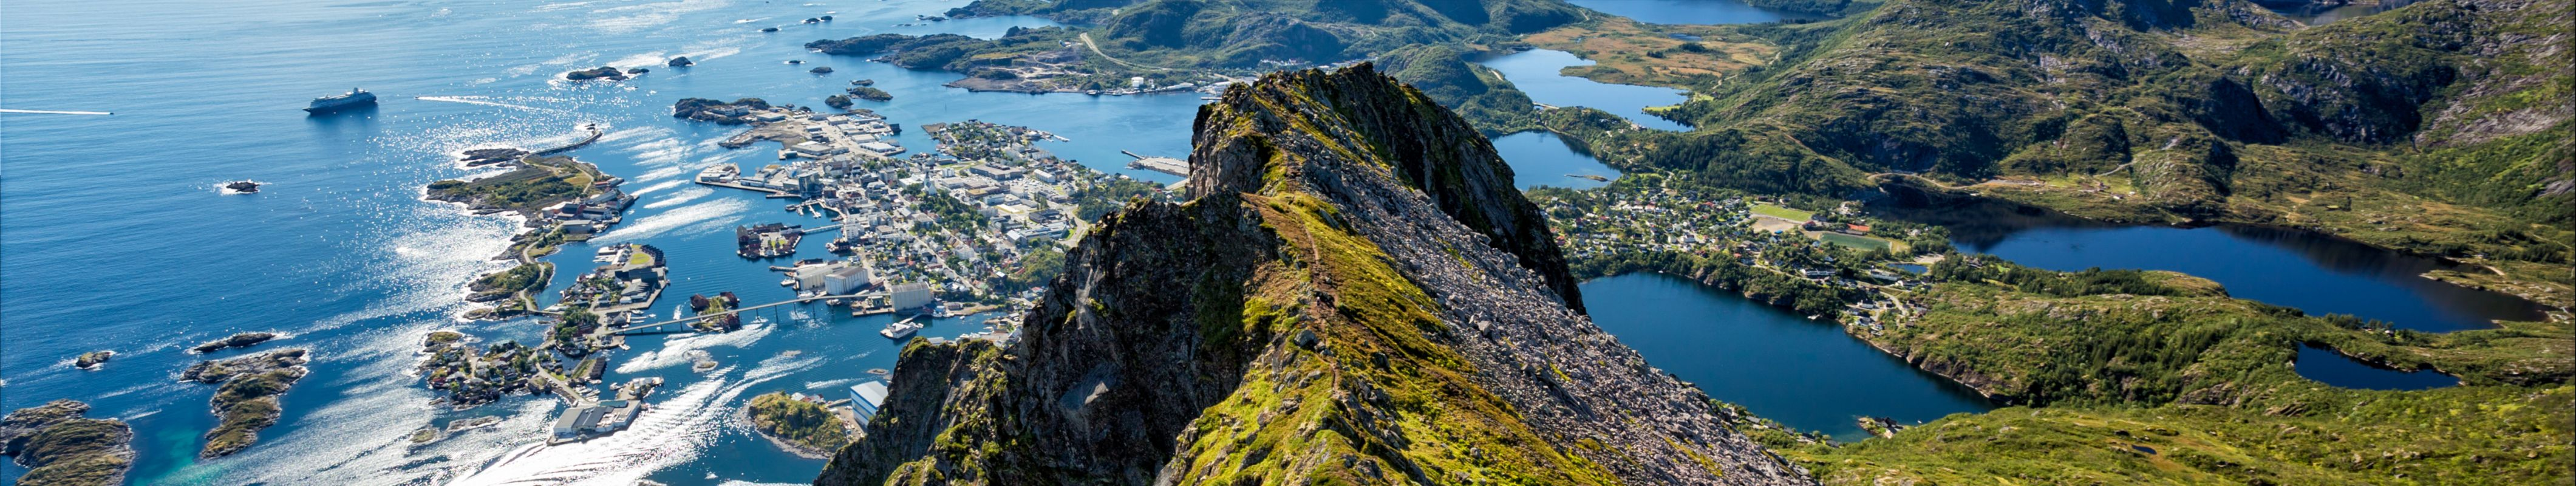 Mit MS Vesterålen die norwegische Küste erkunden